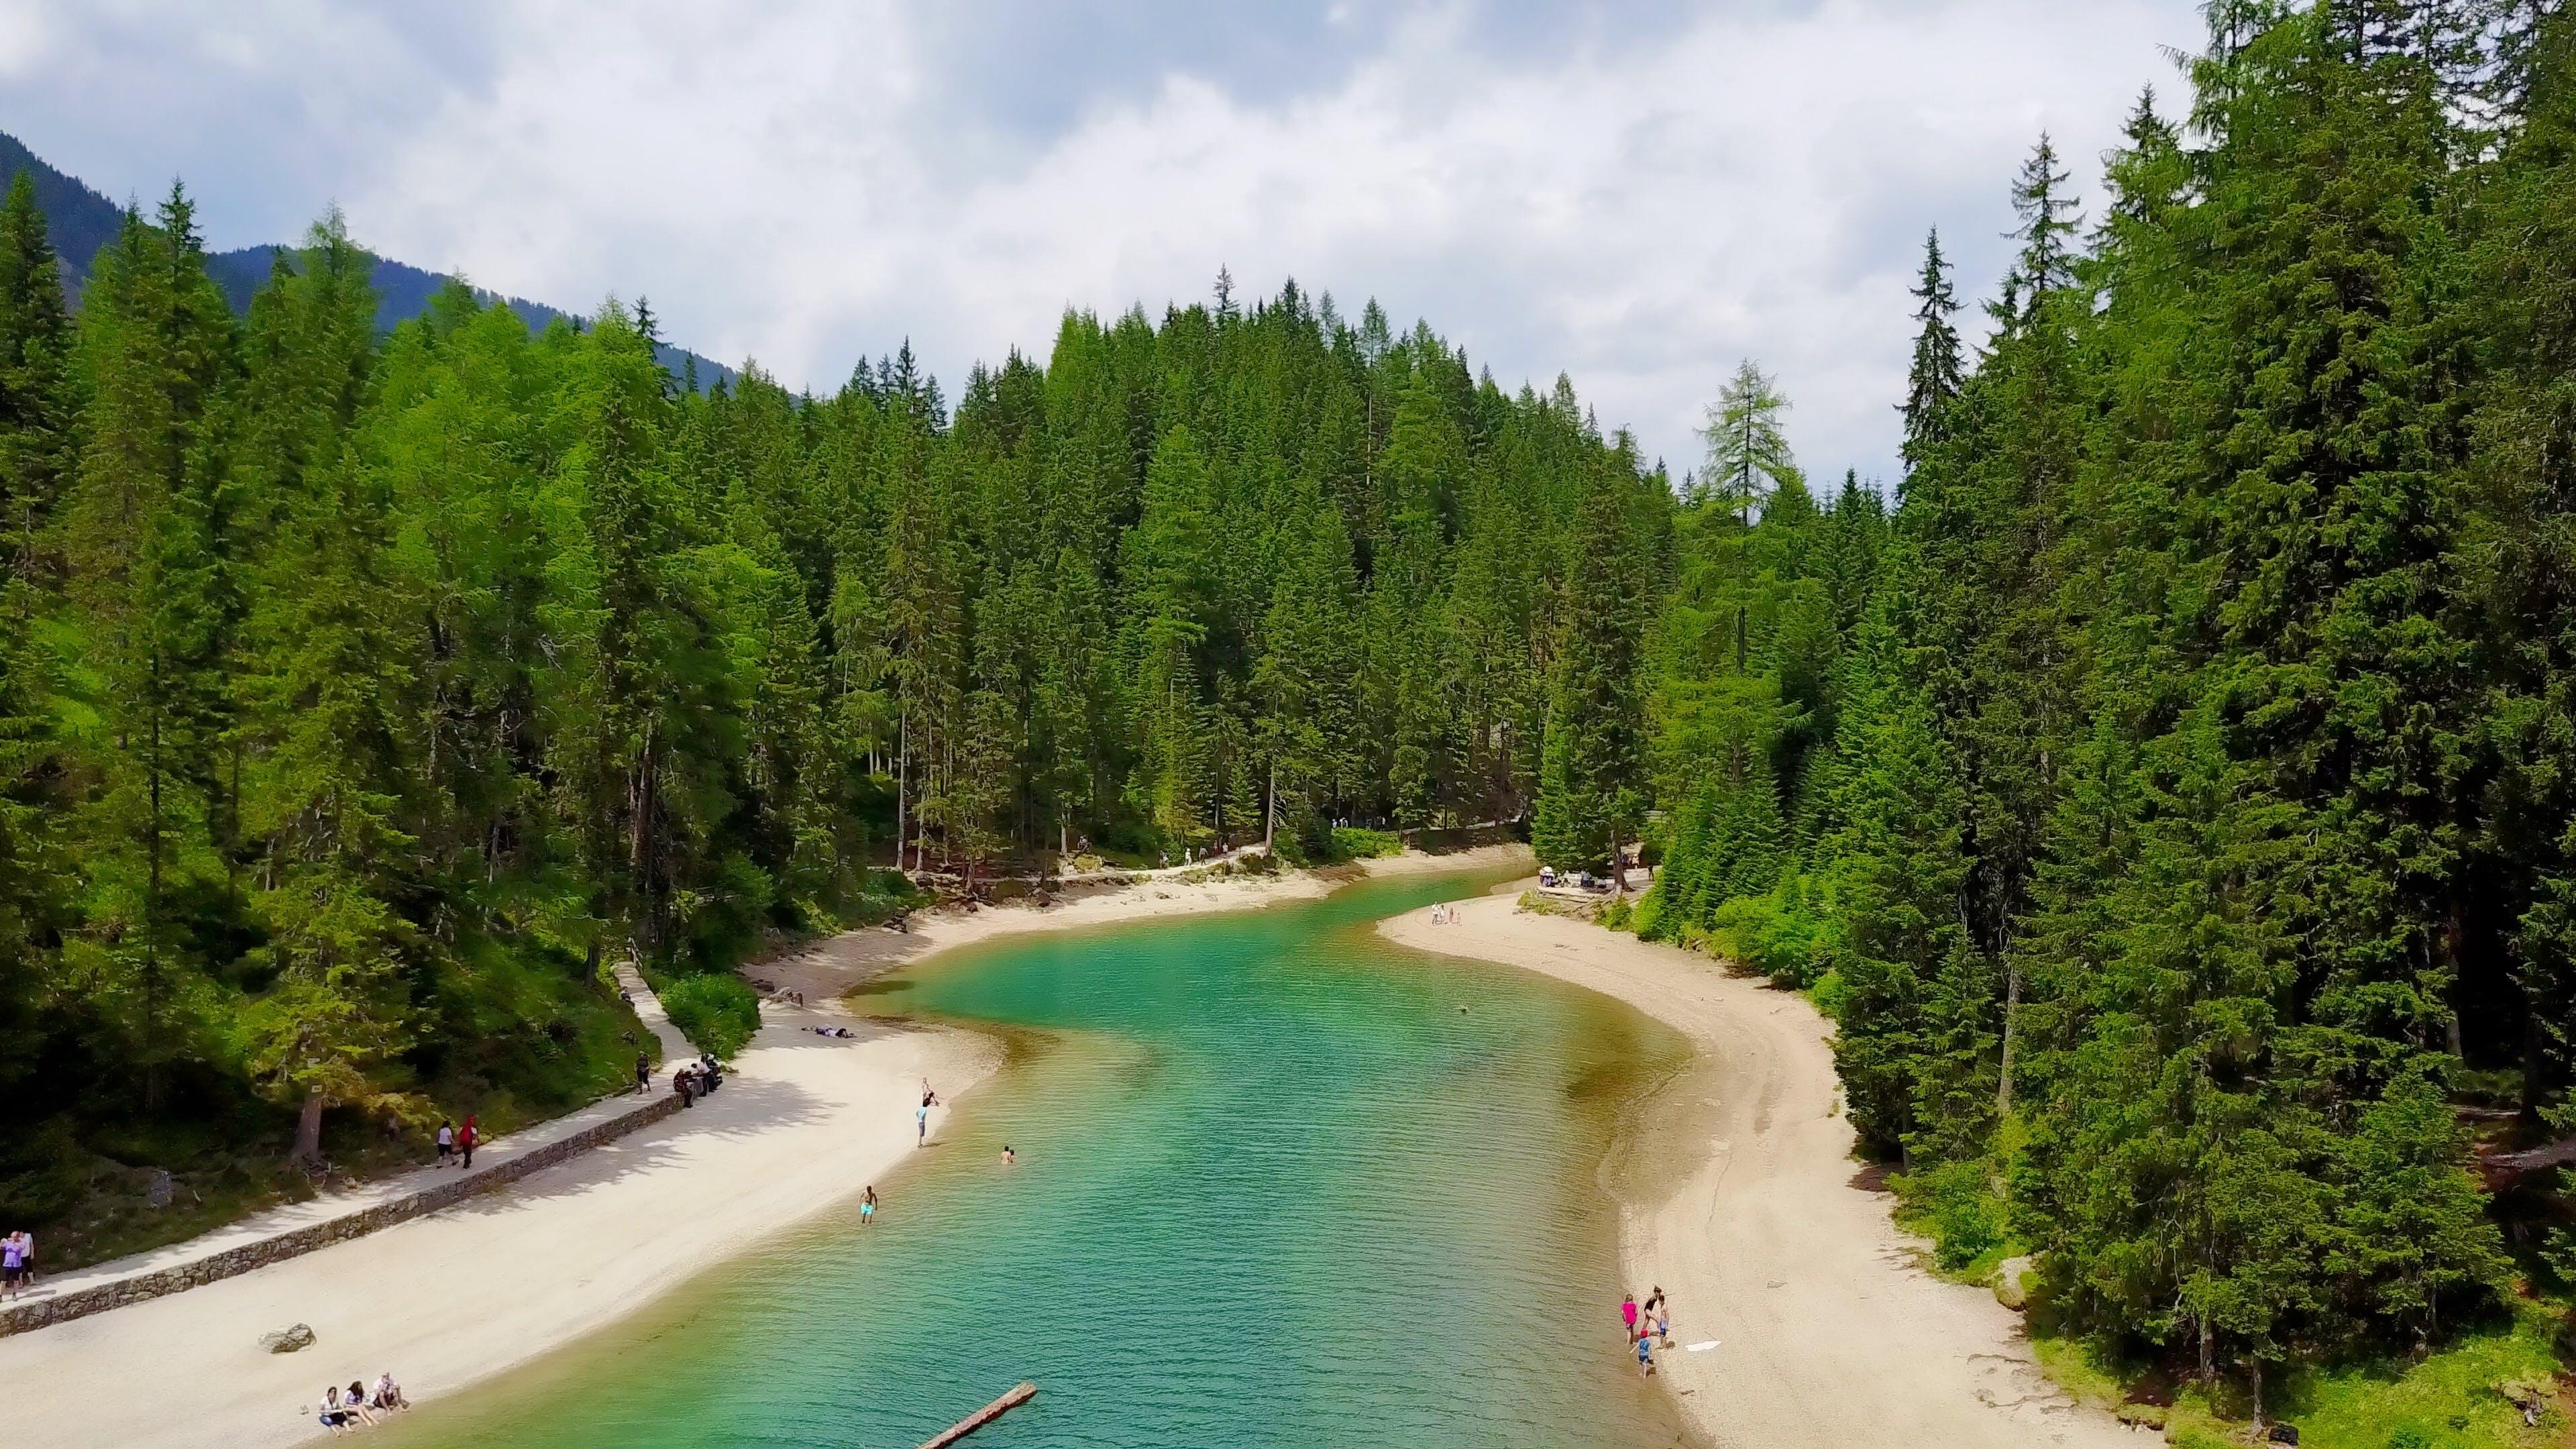 braies, mountain lake, trees